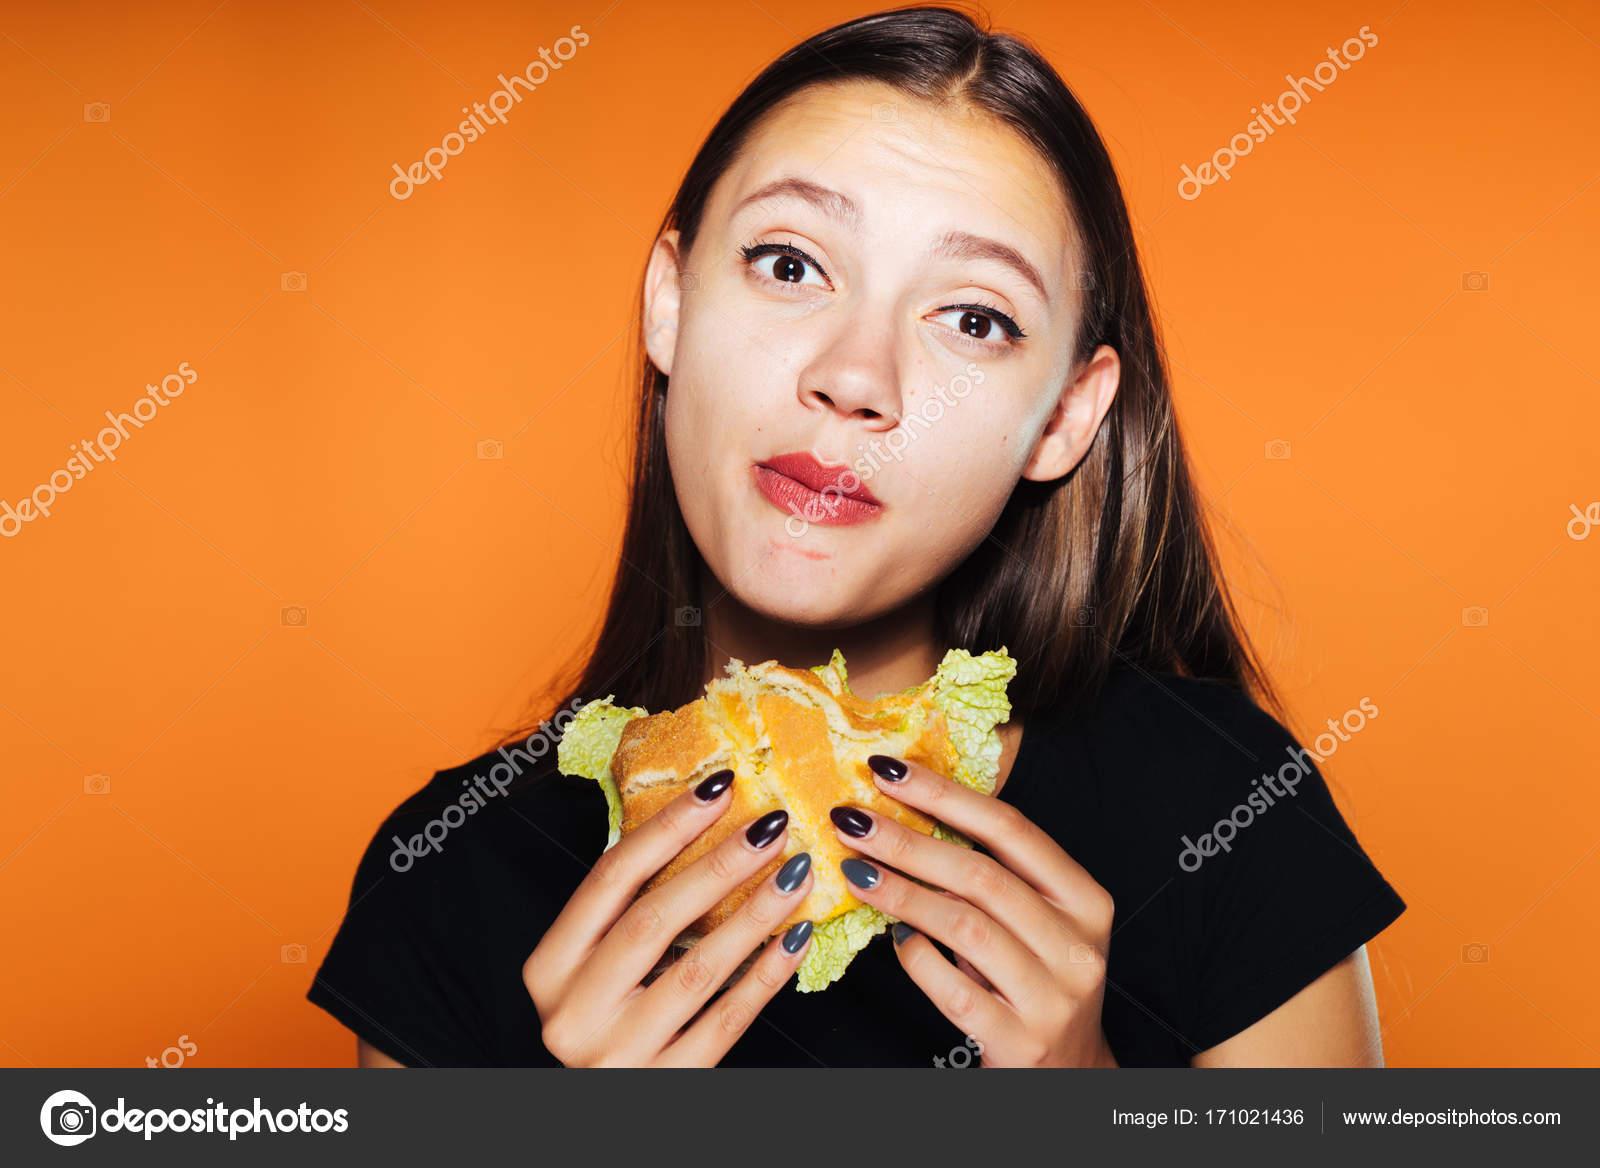 30 day eating plan to lose weight image 3